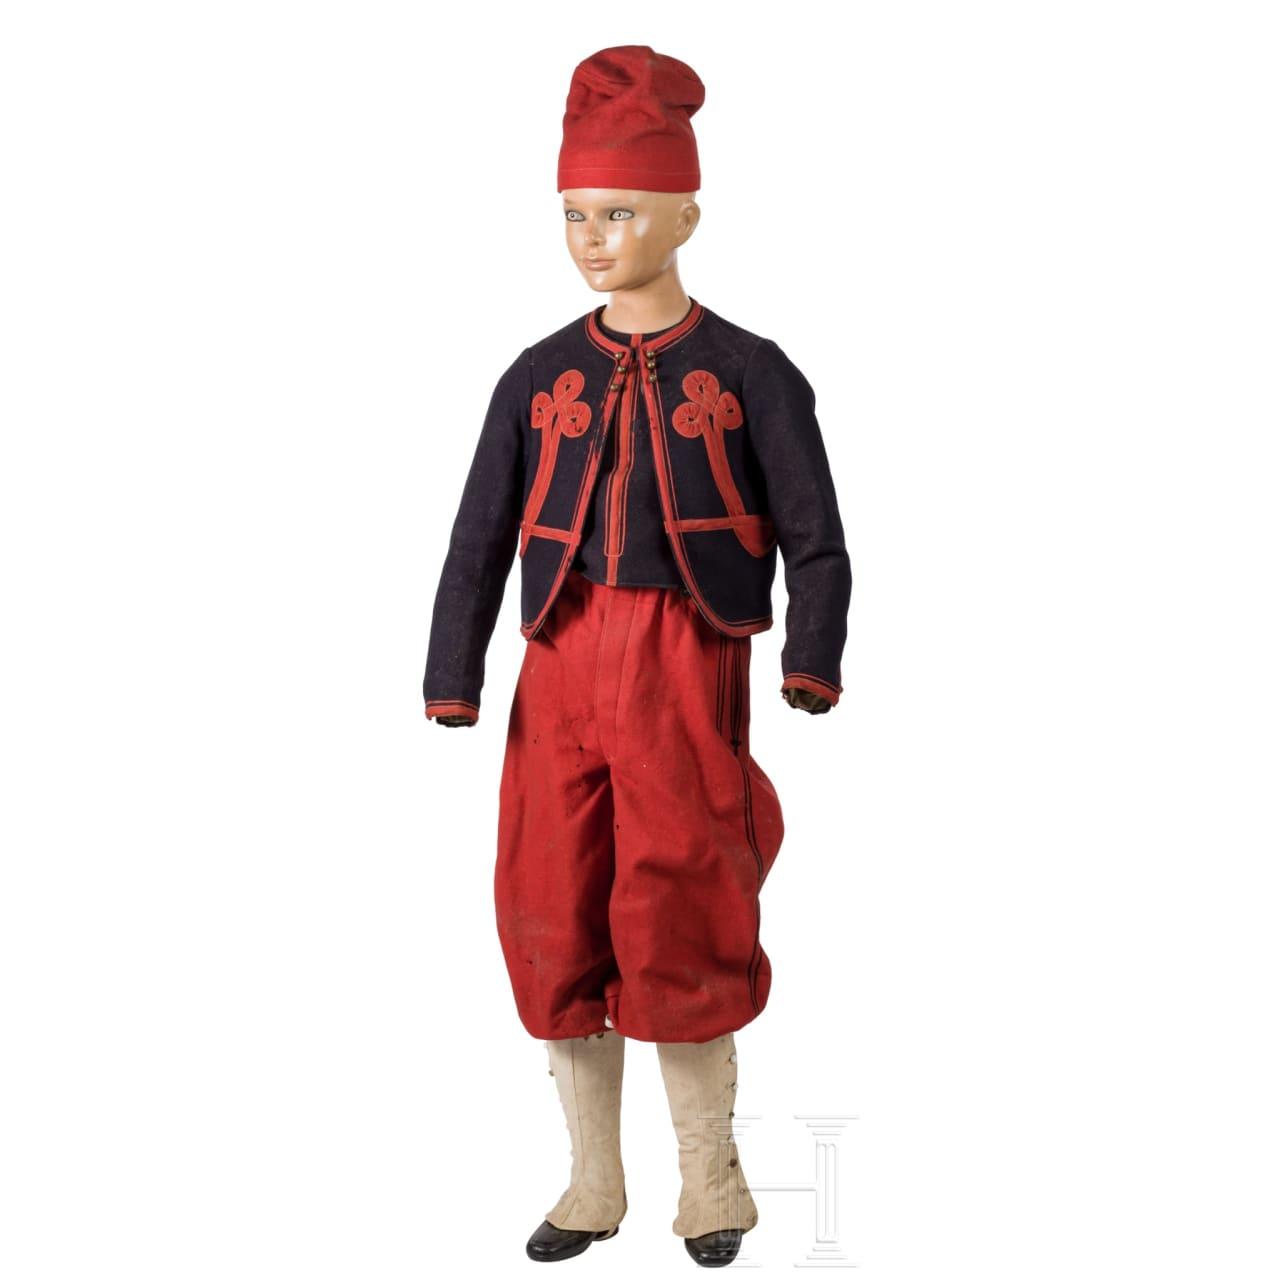 A US-American children's Zouave style uniform, 19th century